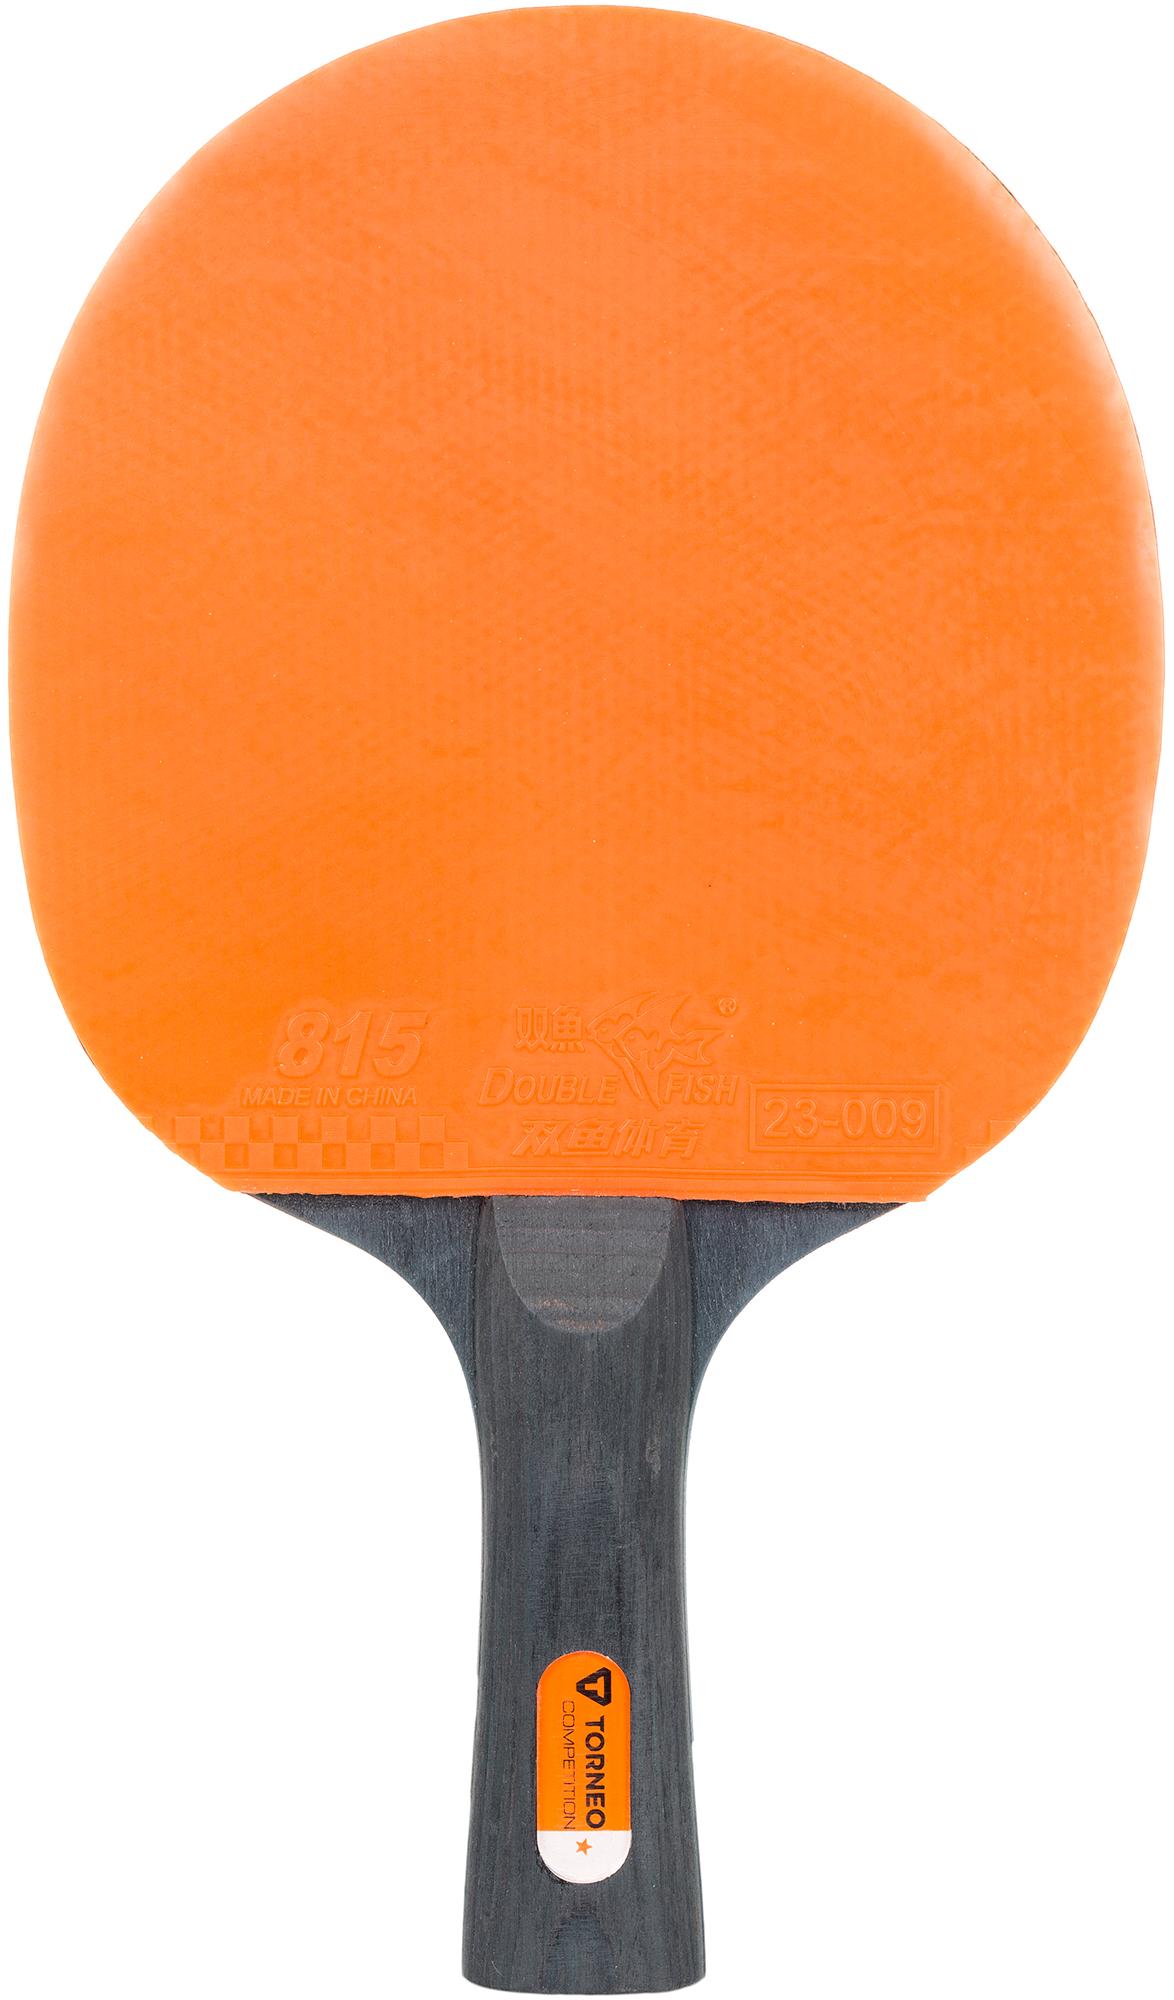 Torneo Ракетка для настольного тенниса Torneo Competition torneo ракетка для настольного тенниса torneo training